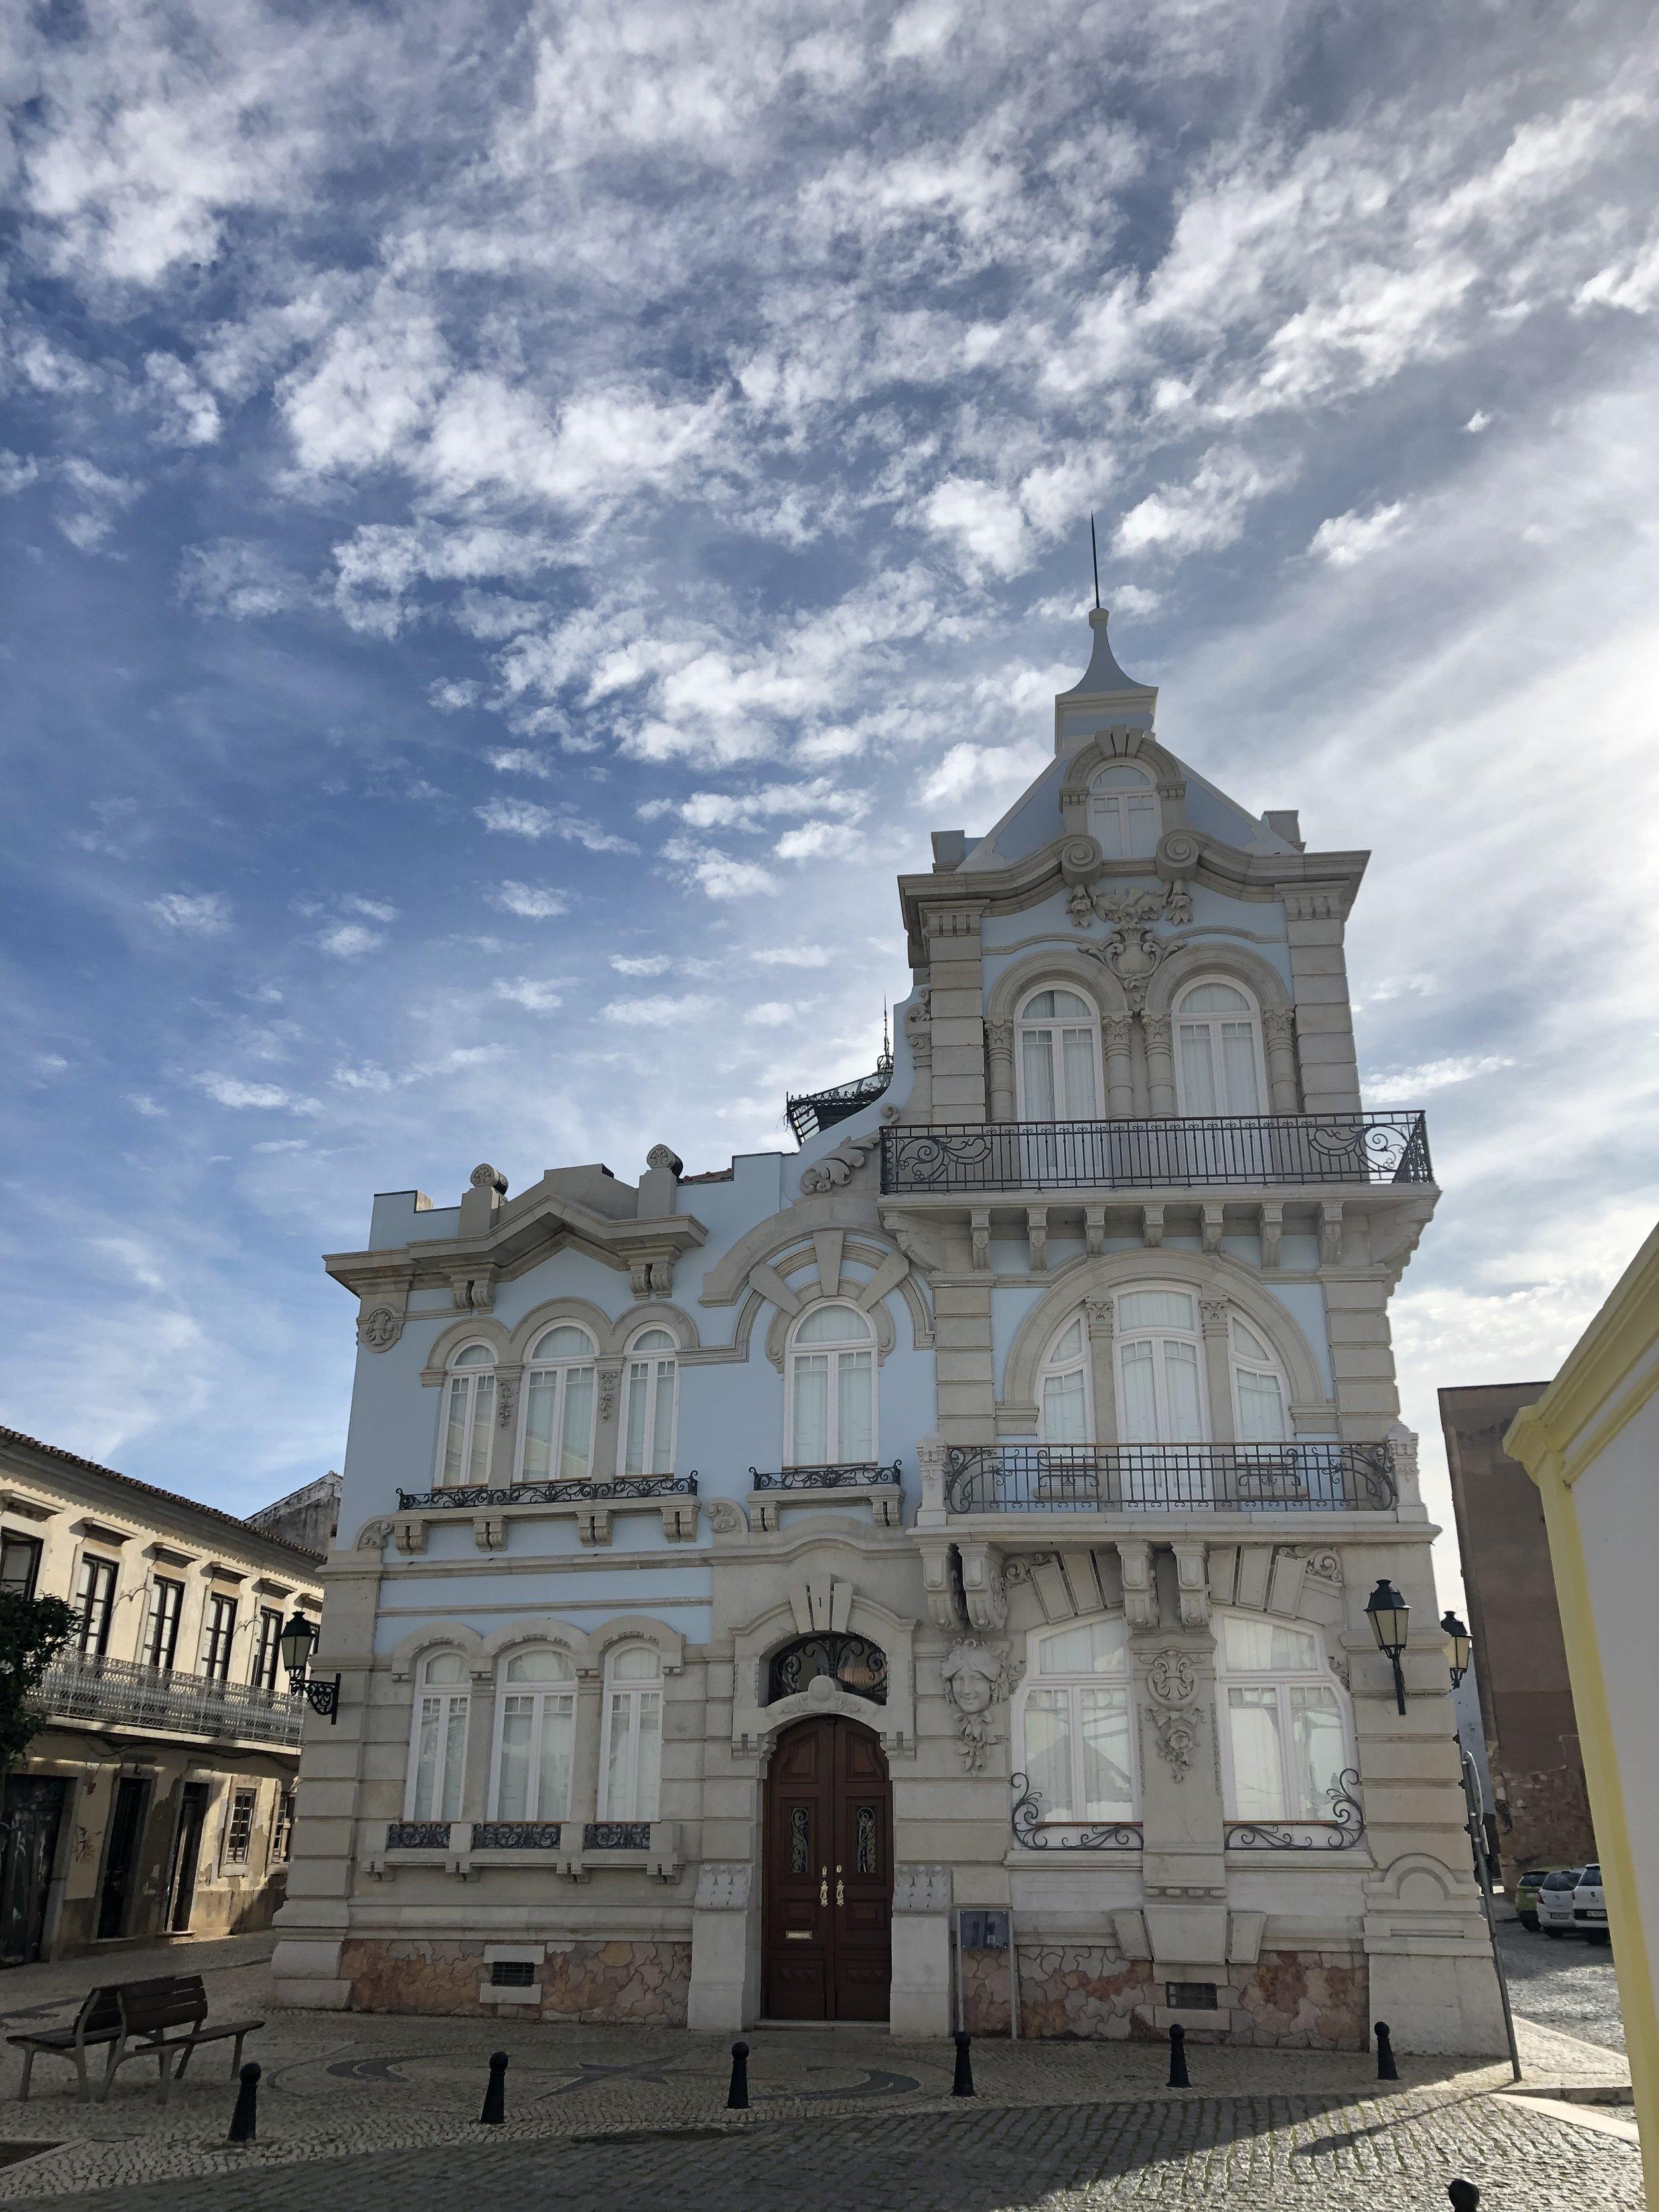 Faroの中心 観光地内の建物。 faroは夏に賑わう街だそうで ガラガラ。